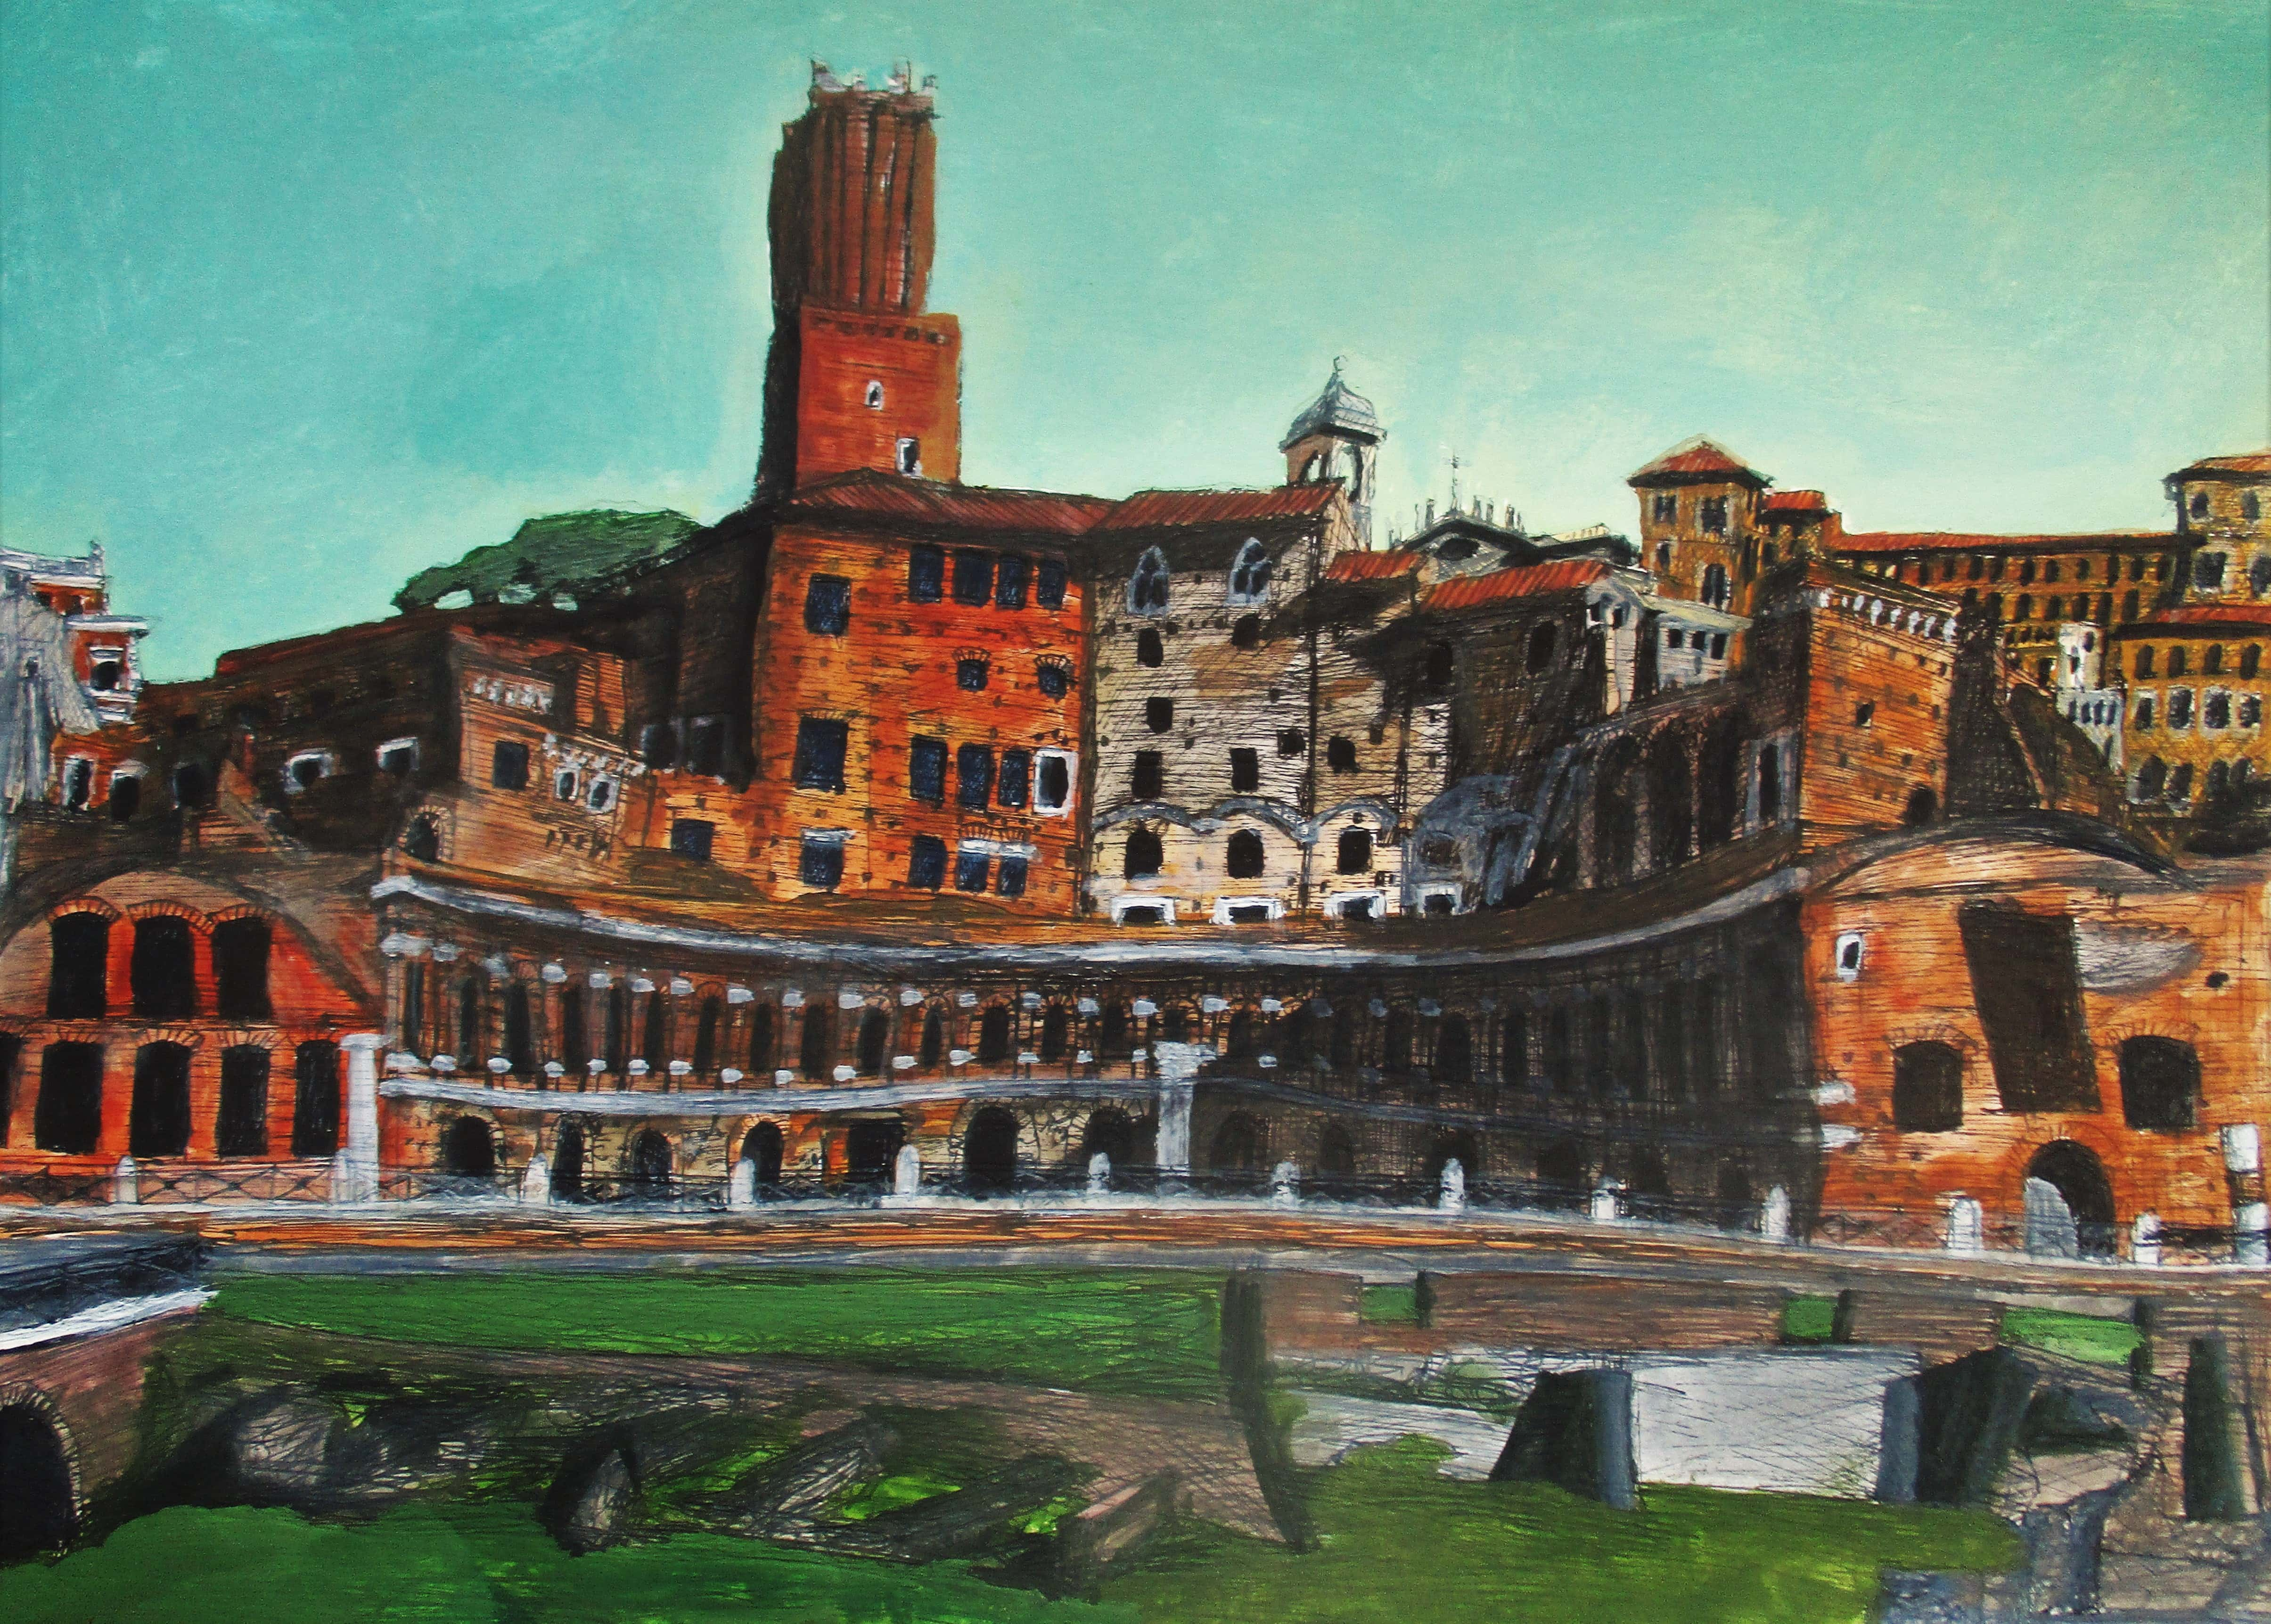 Roma V. Foro de Trajano. Tinta, acuarela y acrílico sobre papel, 42 x 30 cm. 2016